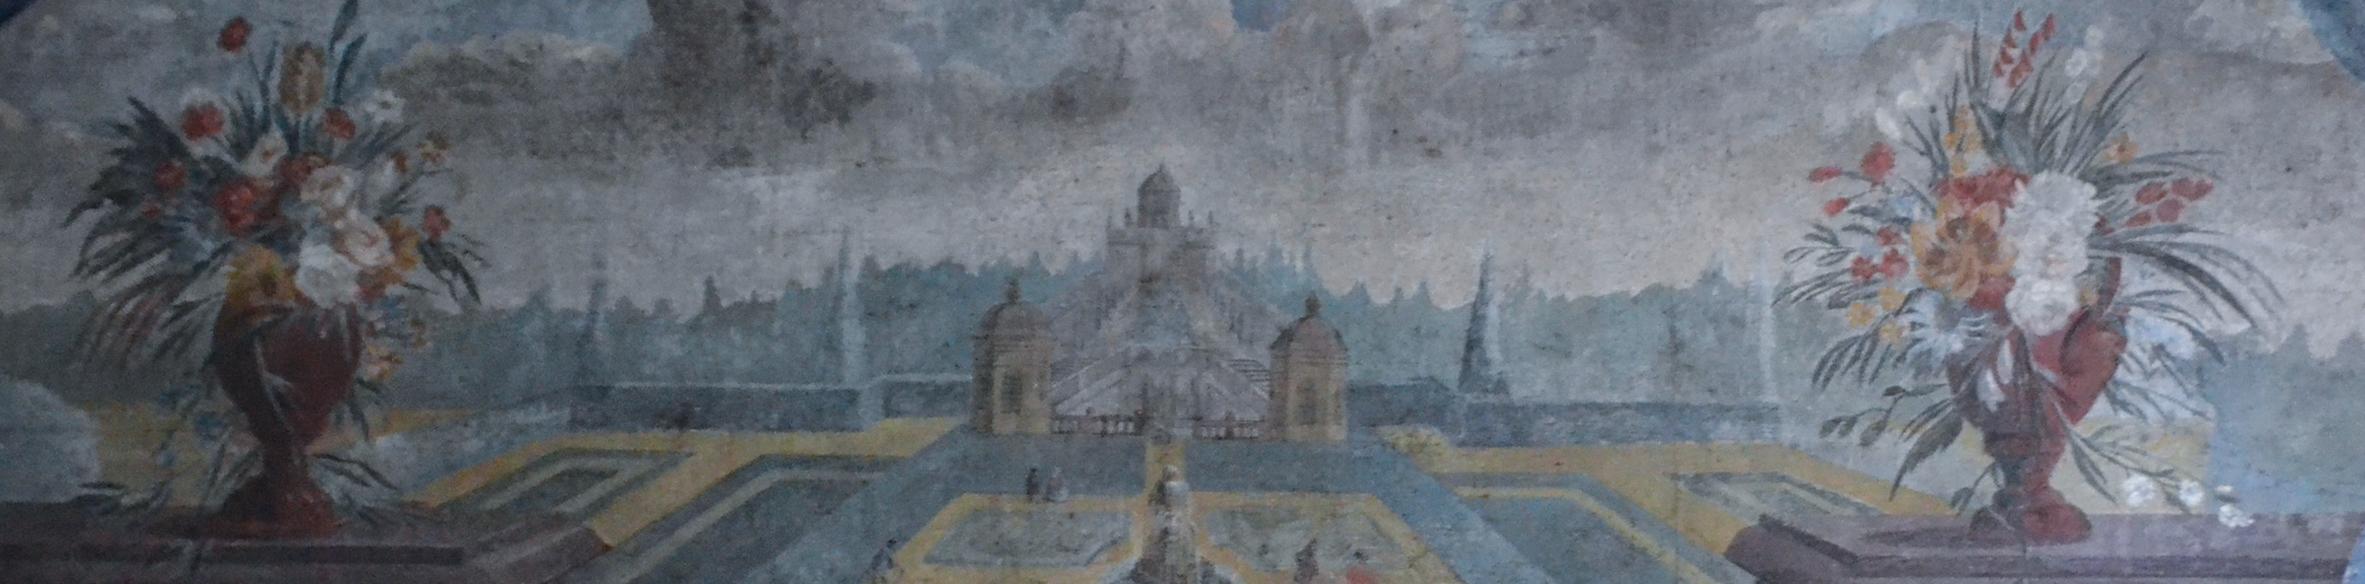 Versaillesrummet at Gathenhielmksa Huset